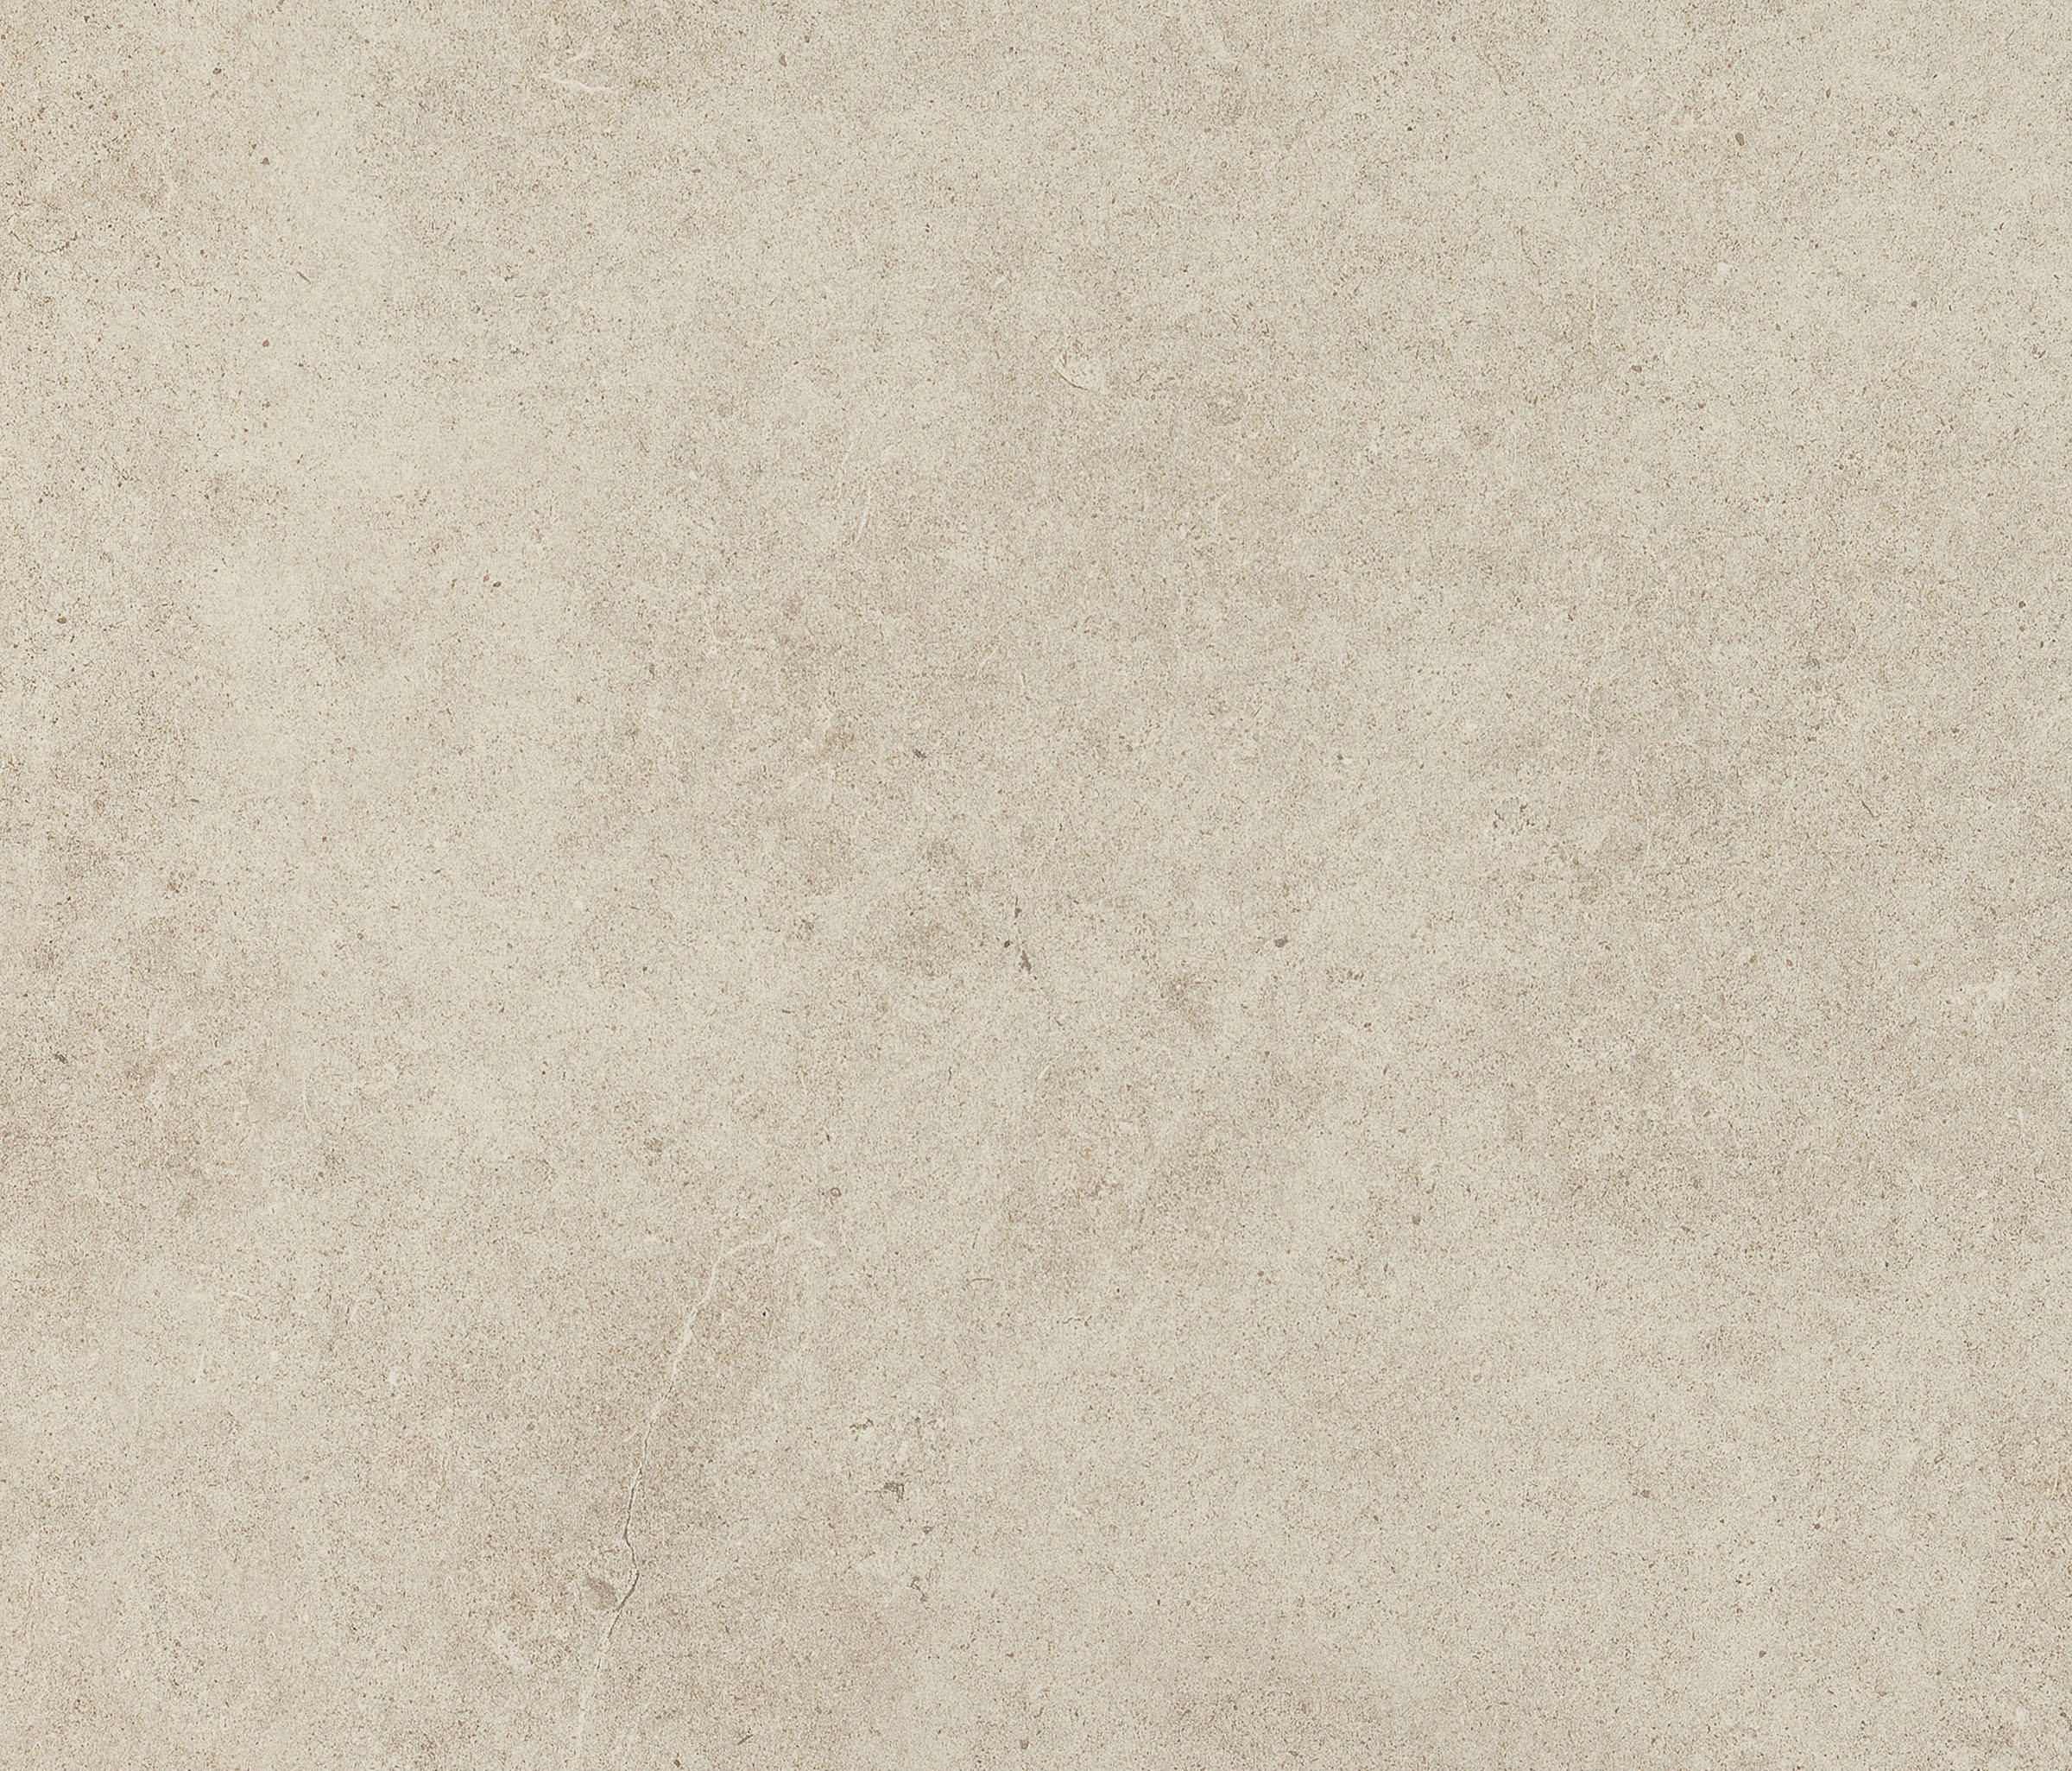 Mystone silverstone beige tiles from marazzi group for Carrelage marazzi prix